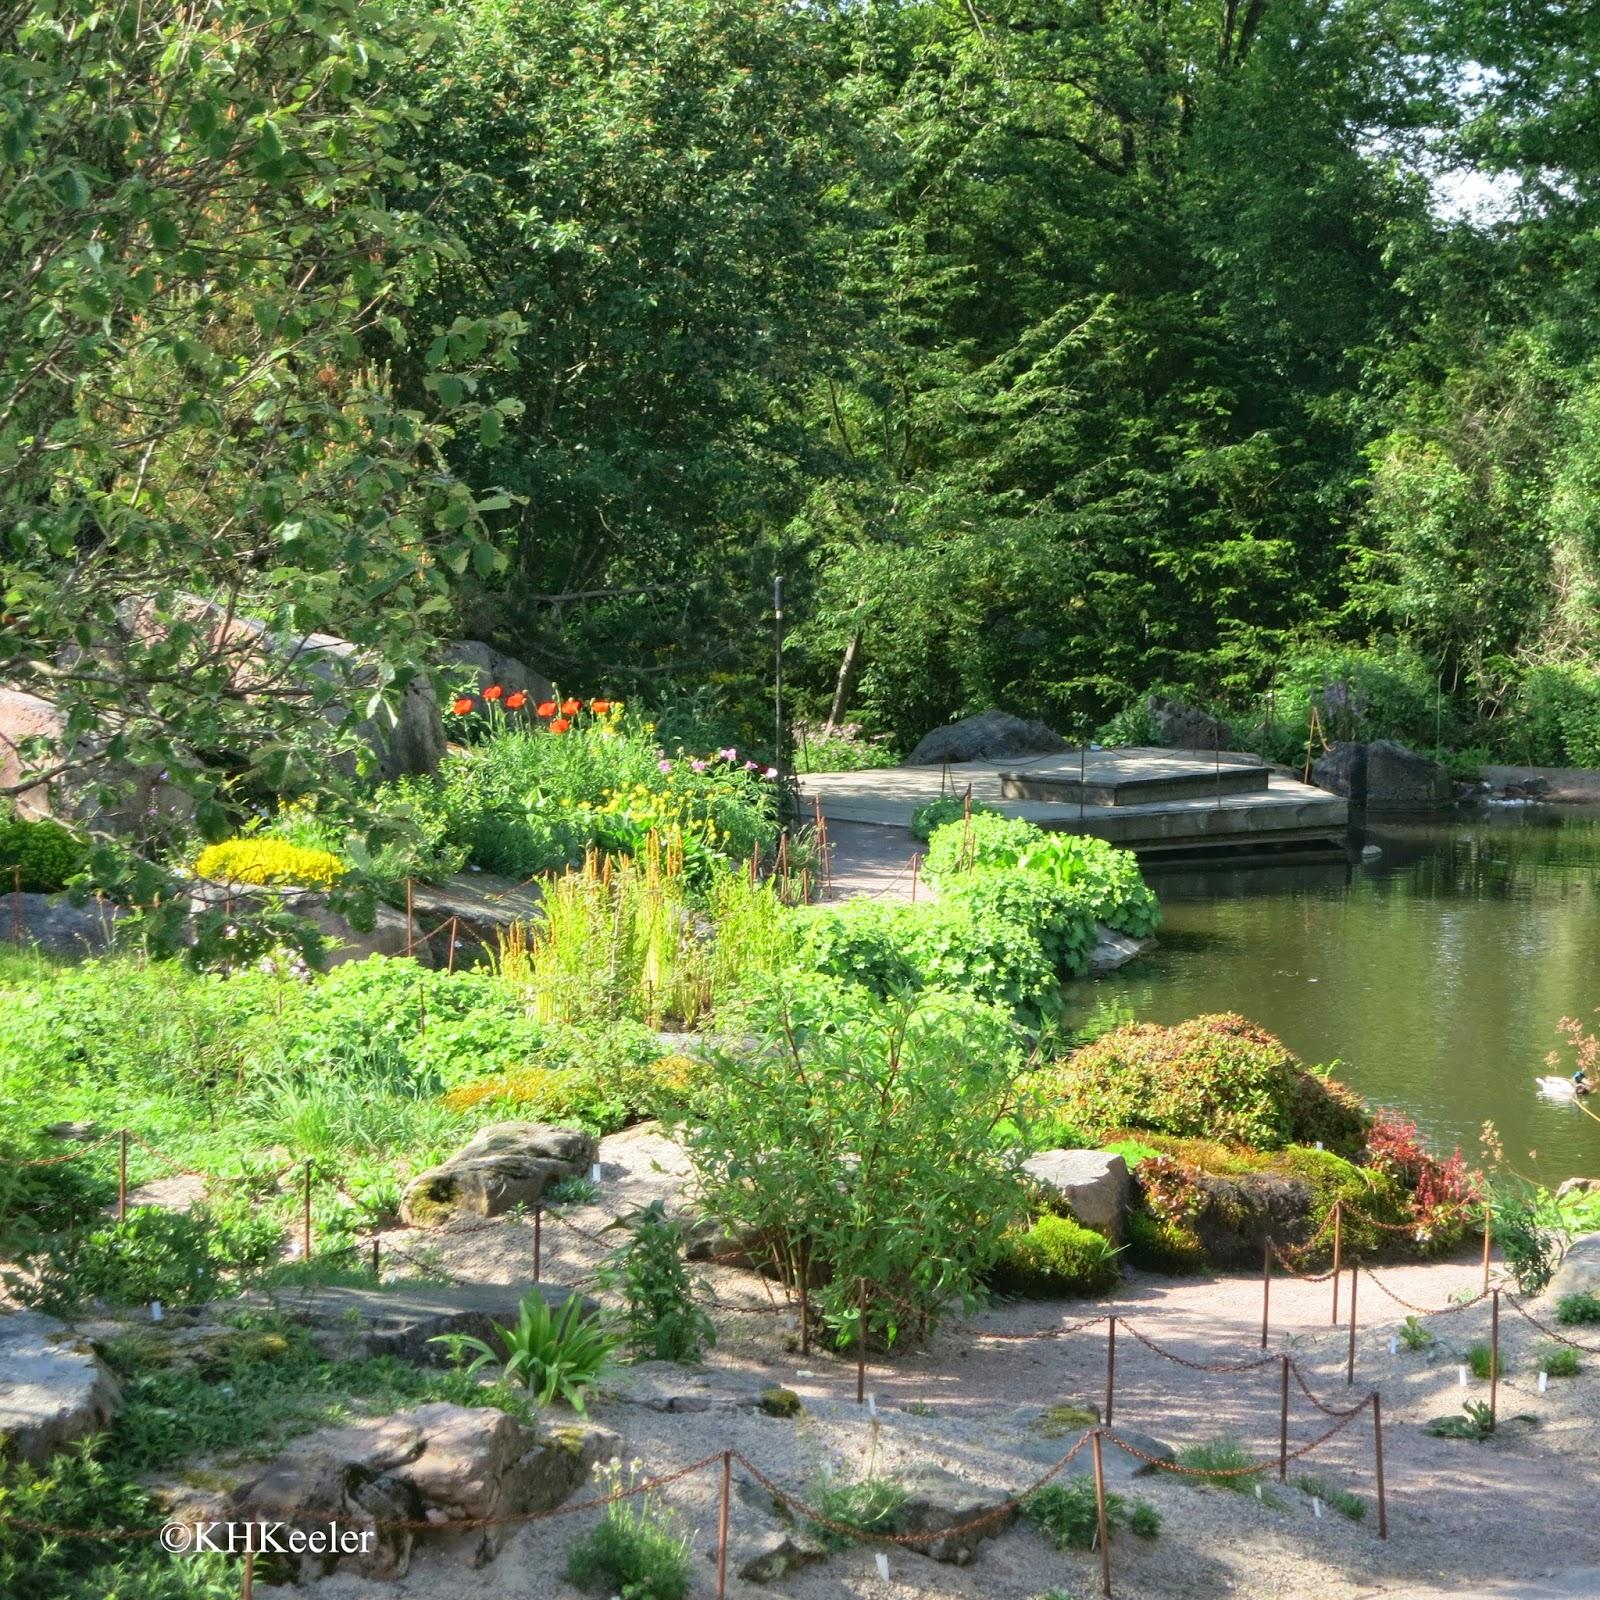 Gothenburg Botanic Garden